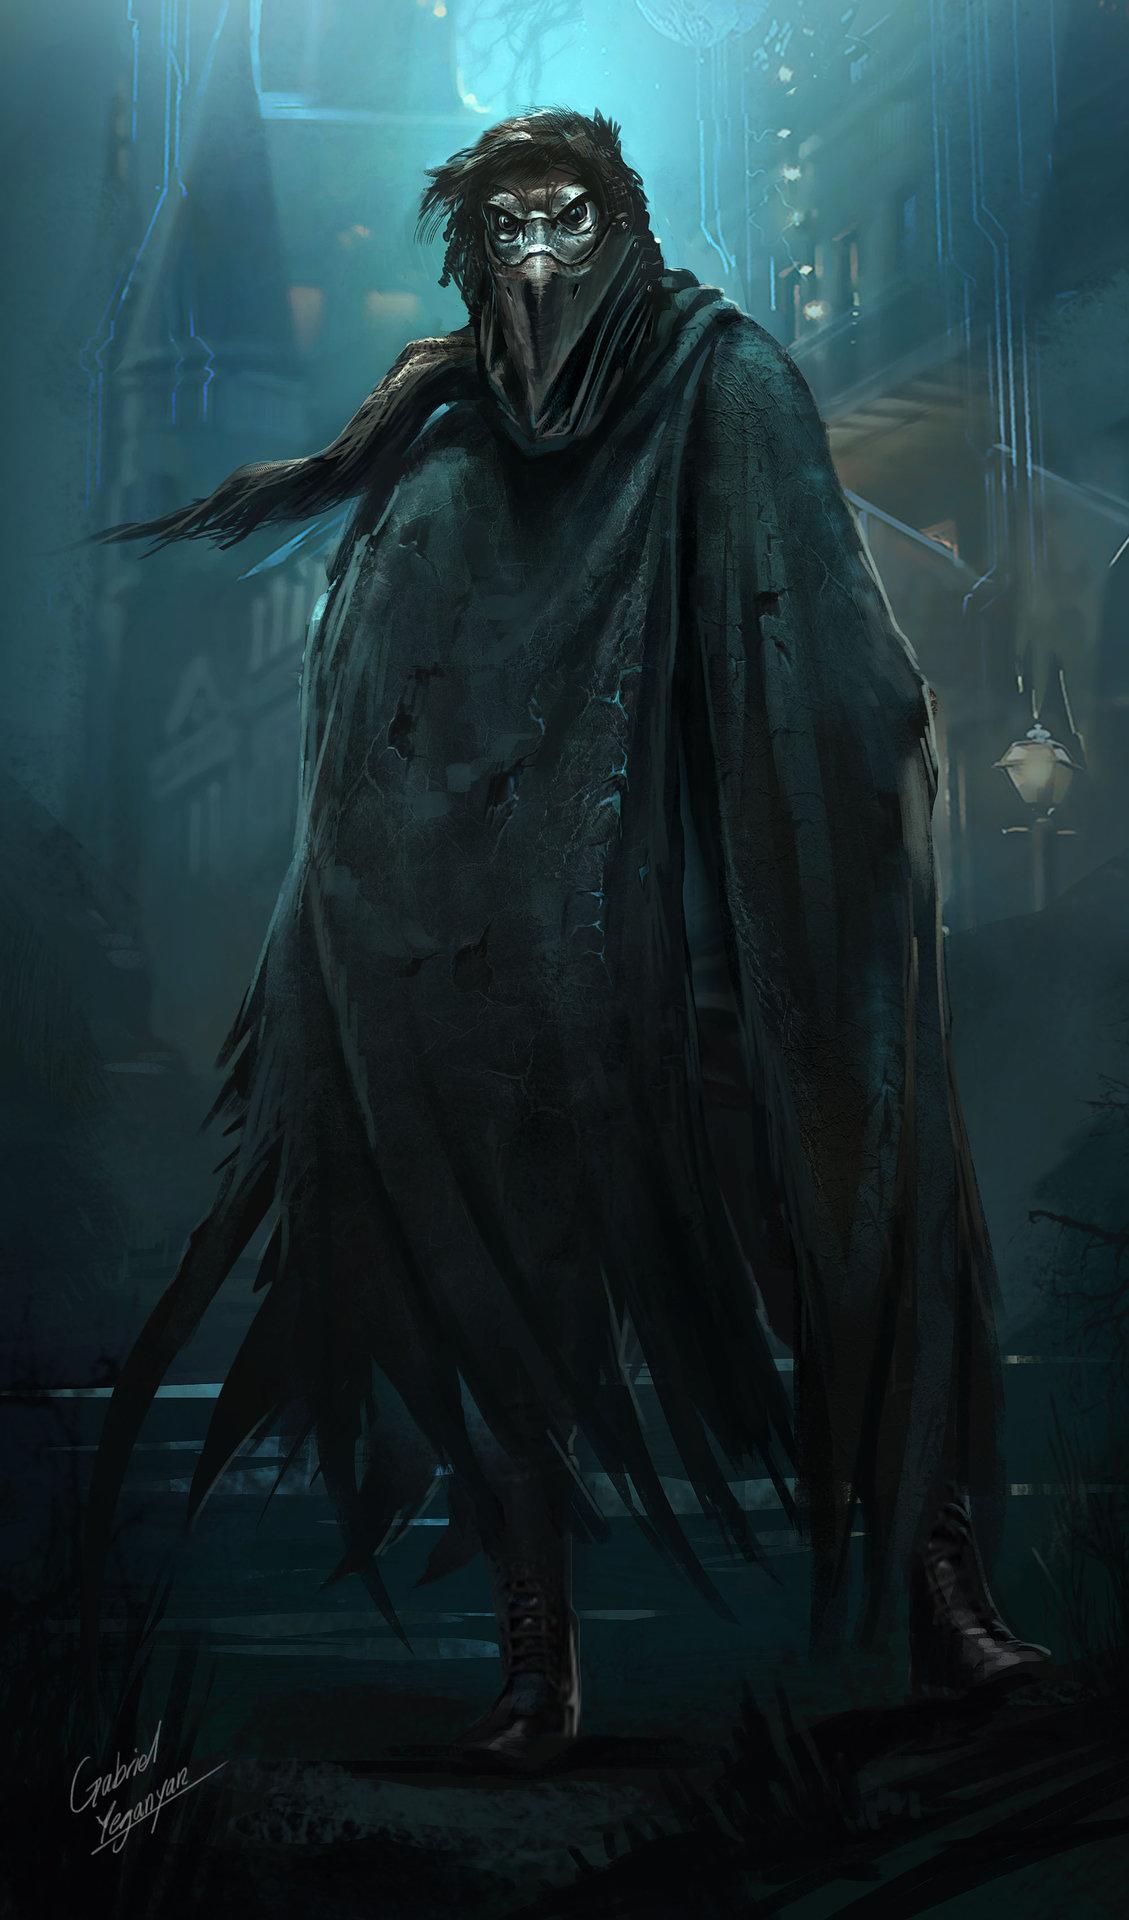 Gabriel yeganyan corvus final cloaked 2